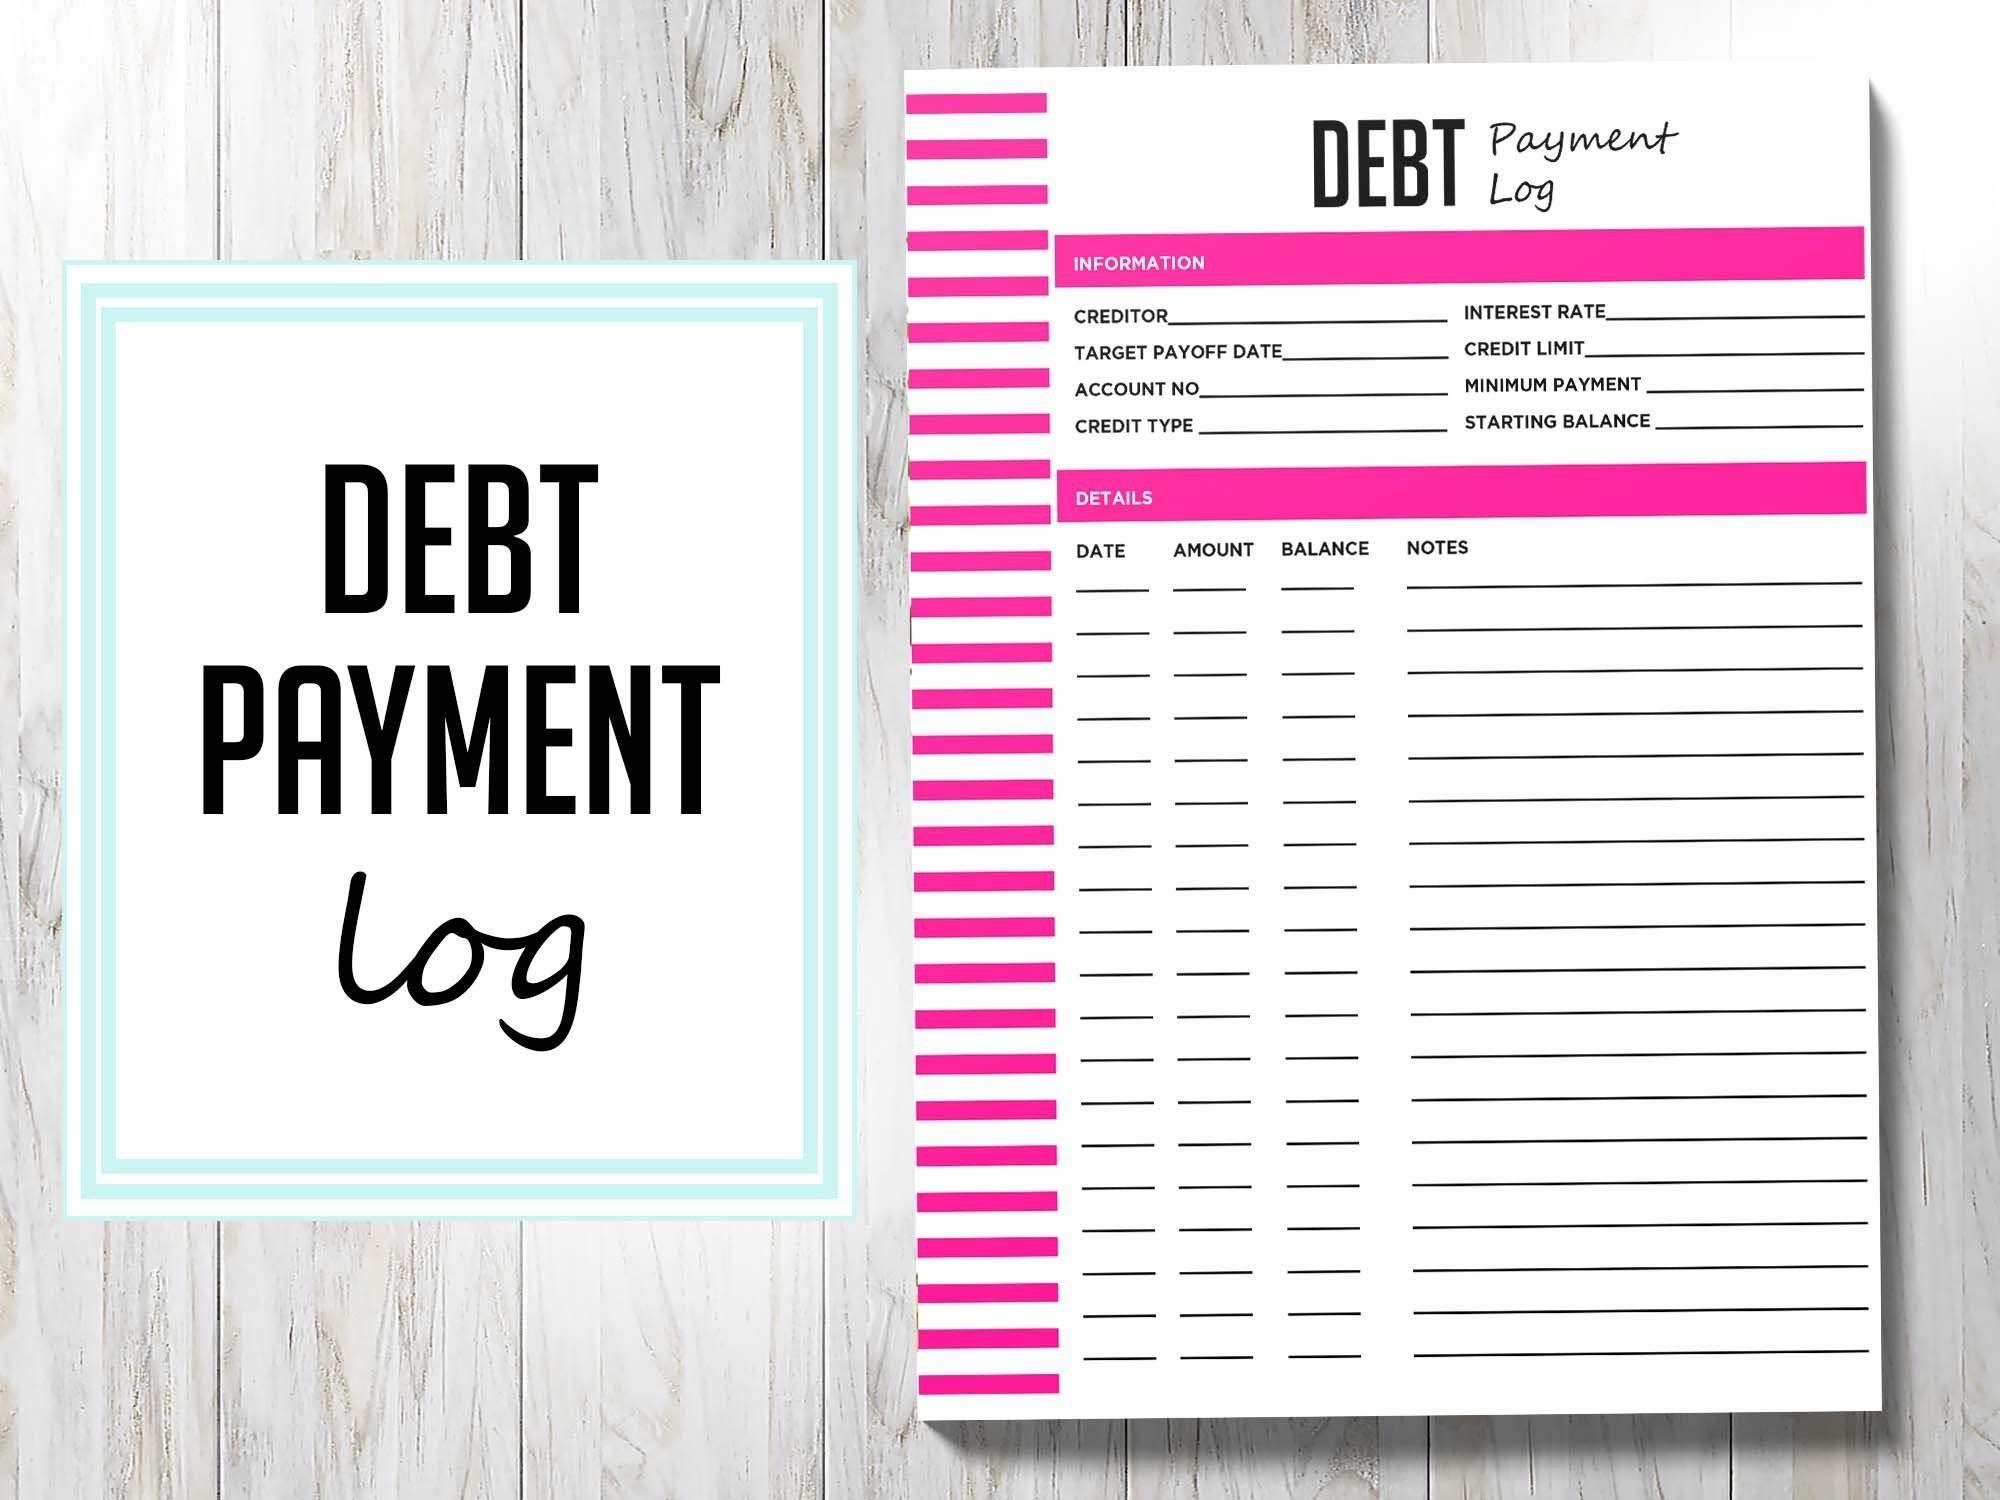 2021 A5 Debt Payment Log Planner Printable 2021 A5 Budget-2021 Printable Bill Planner